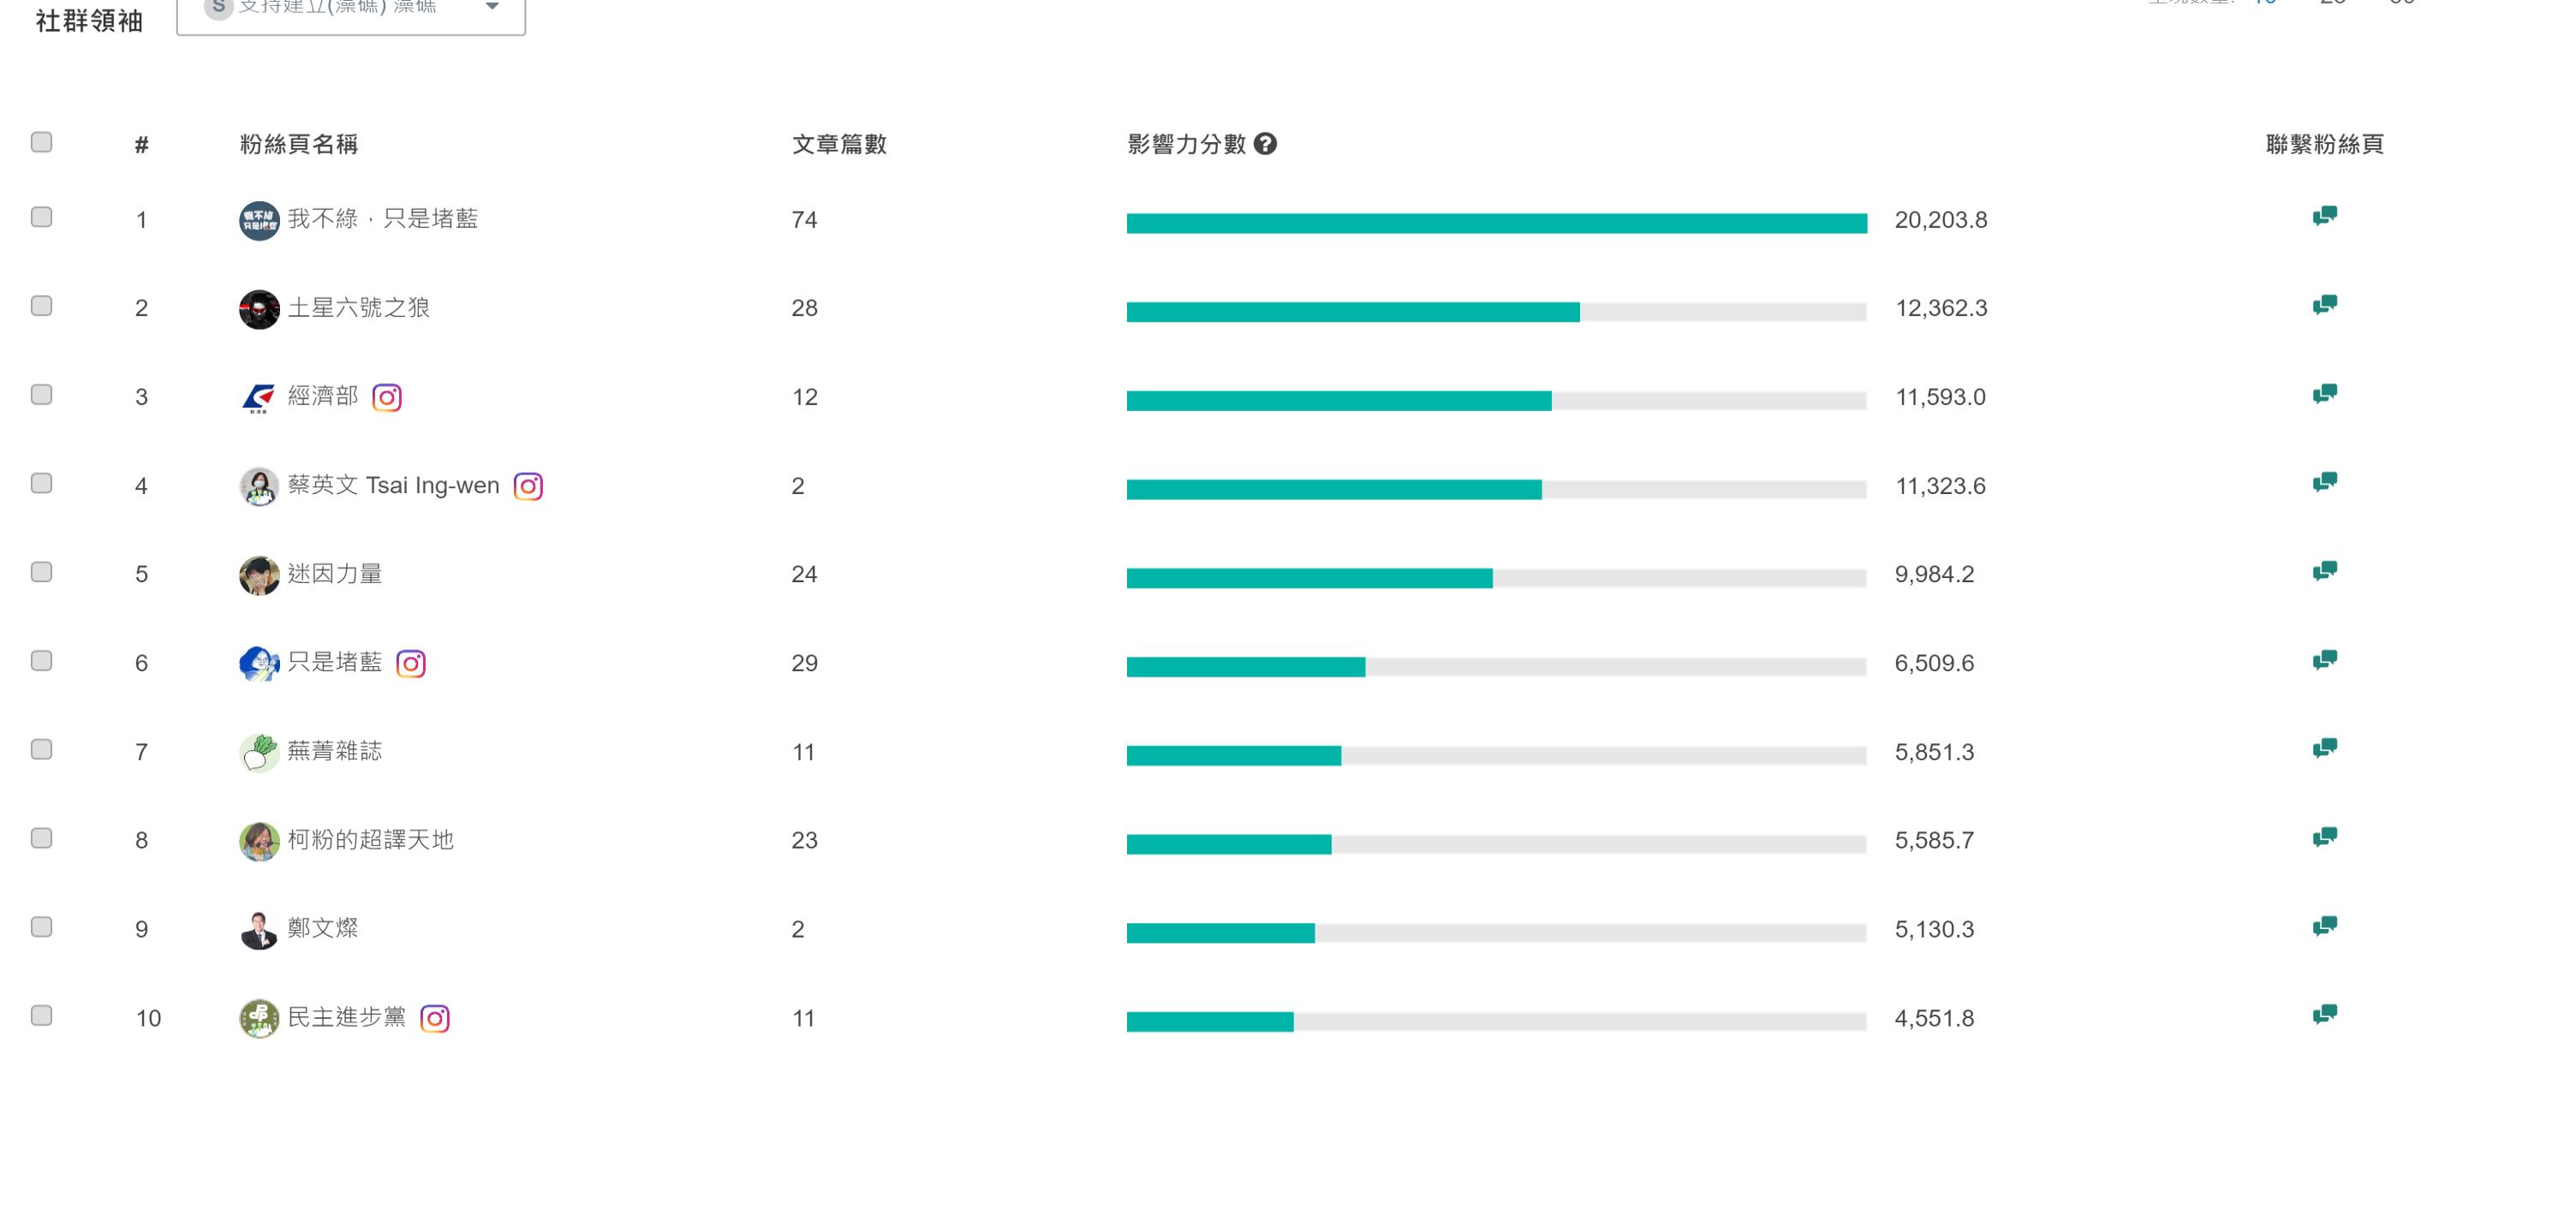 QSH-Trend-topinfluencer (3)